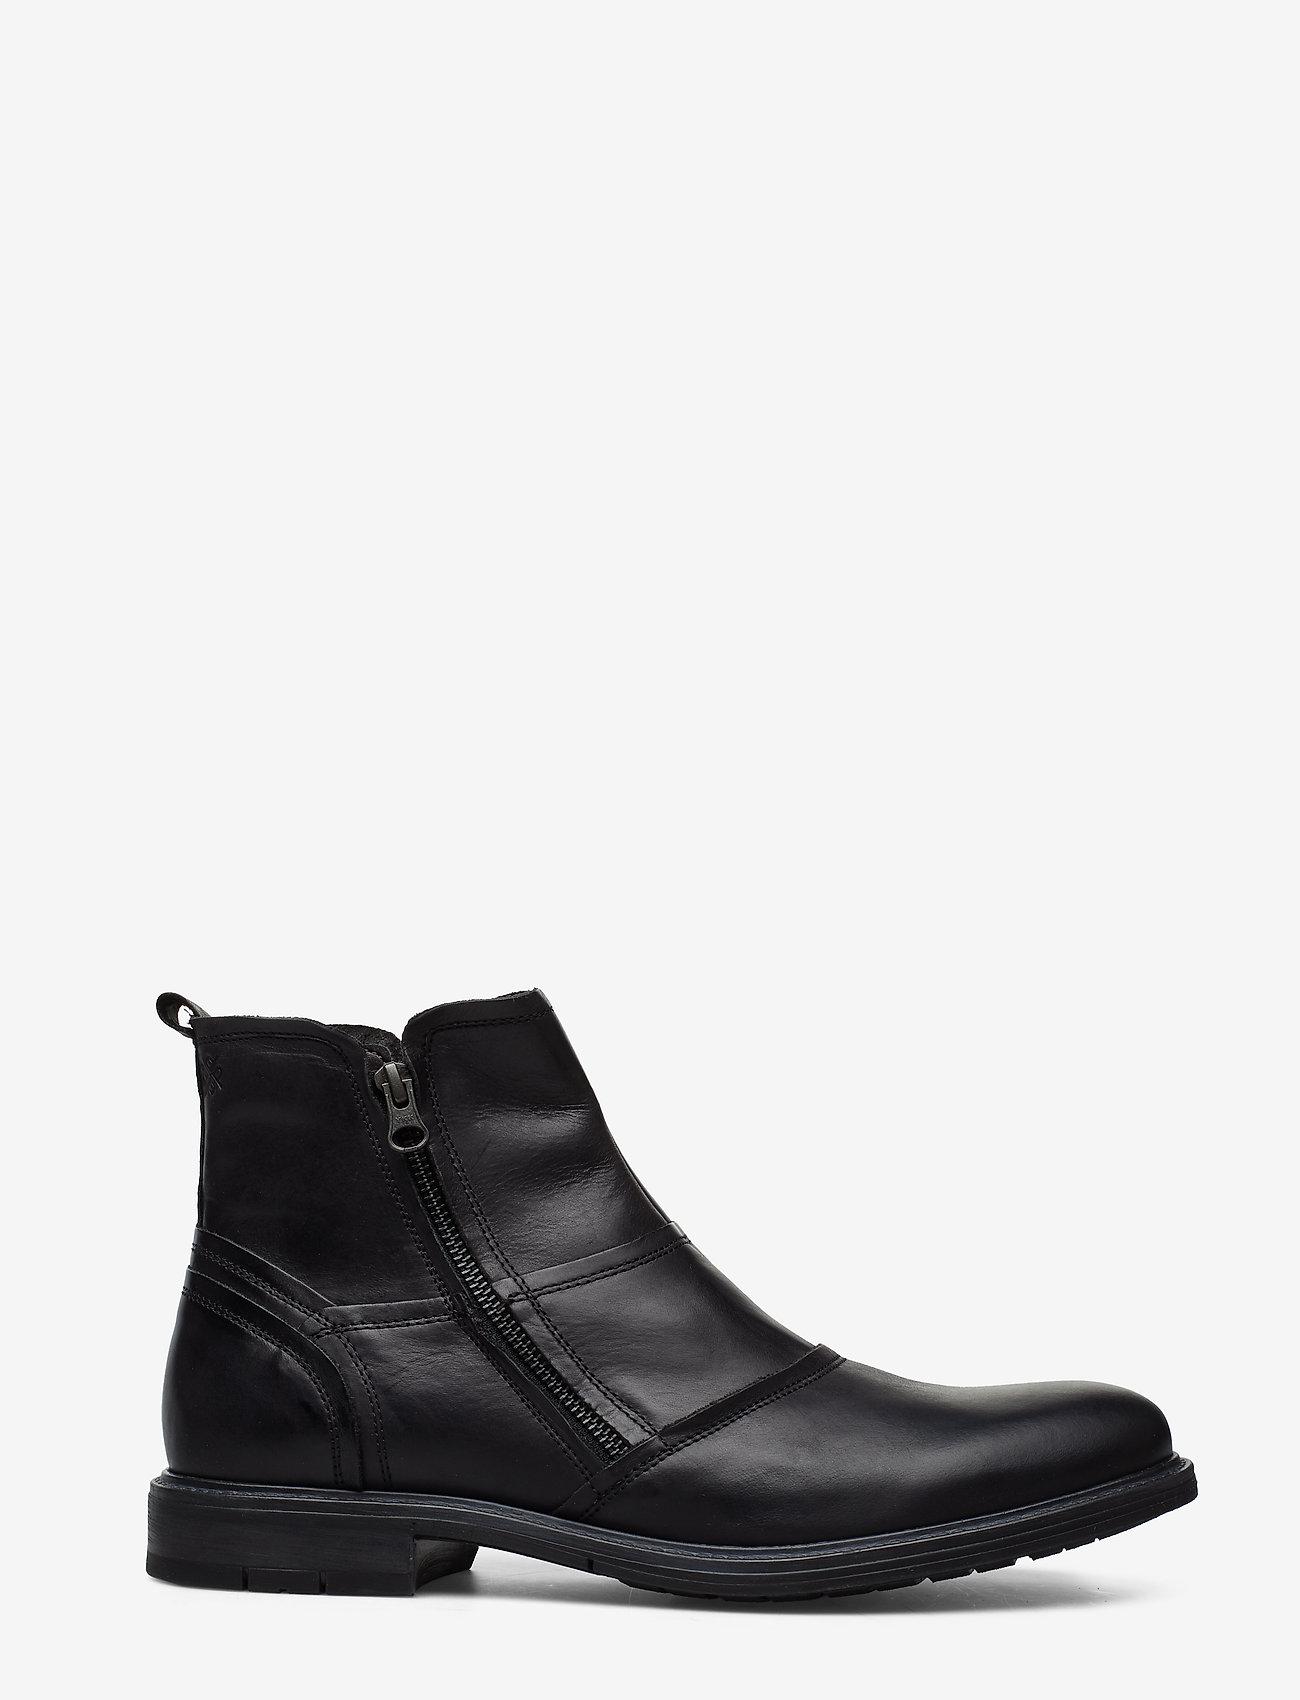 Playboy Footwear 2150 - Chelsea boots BLACK